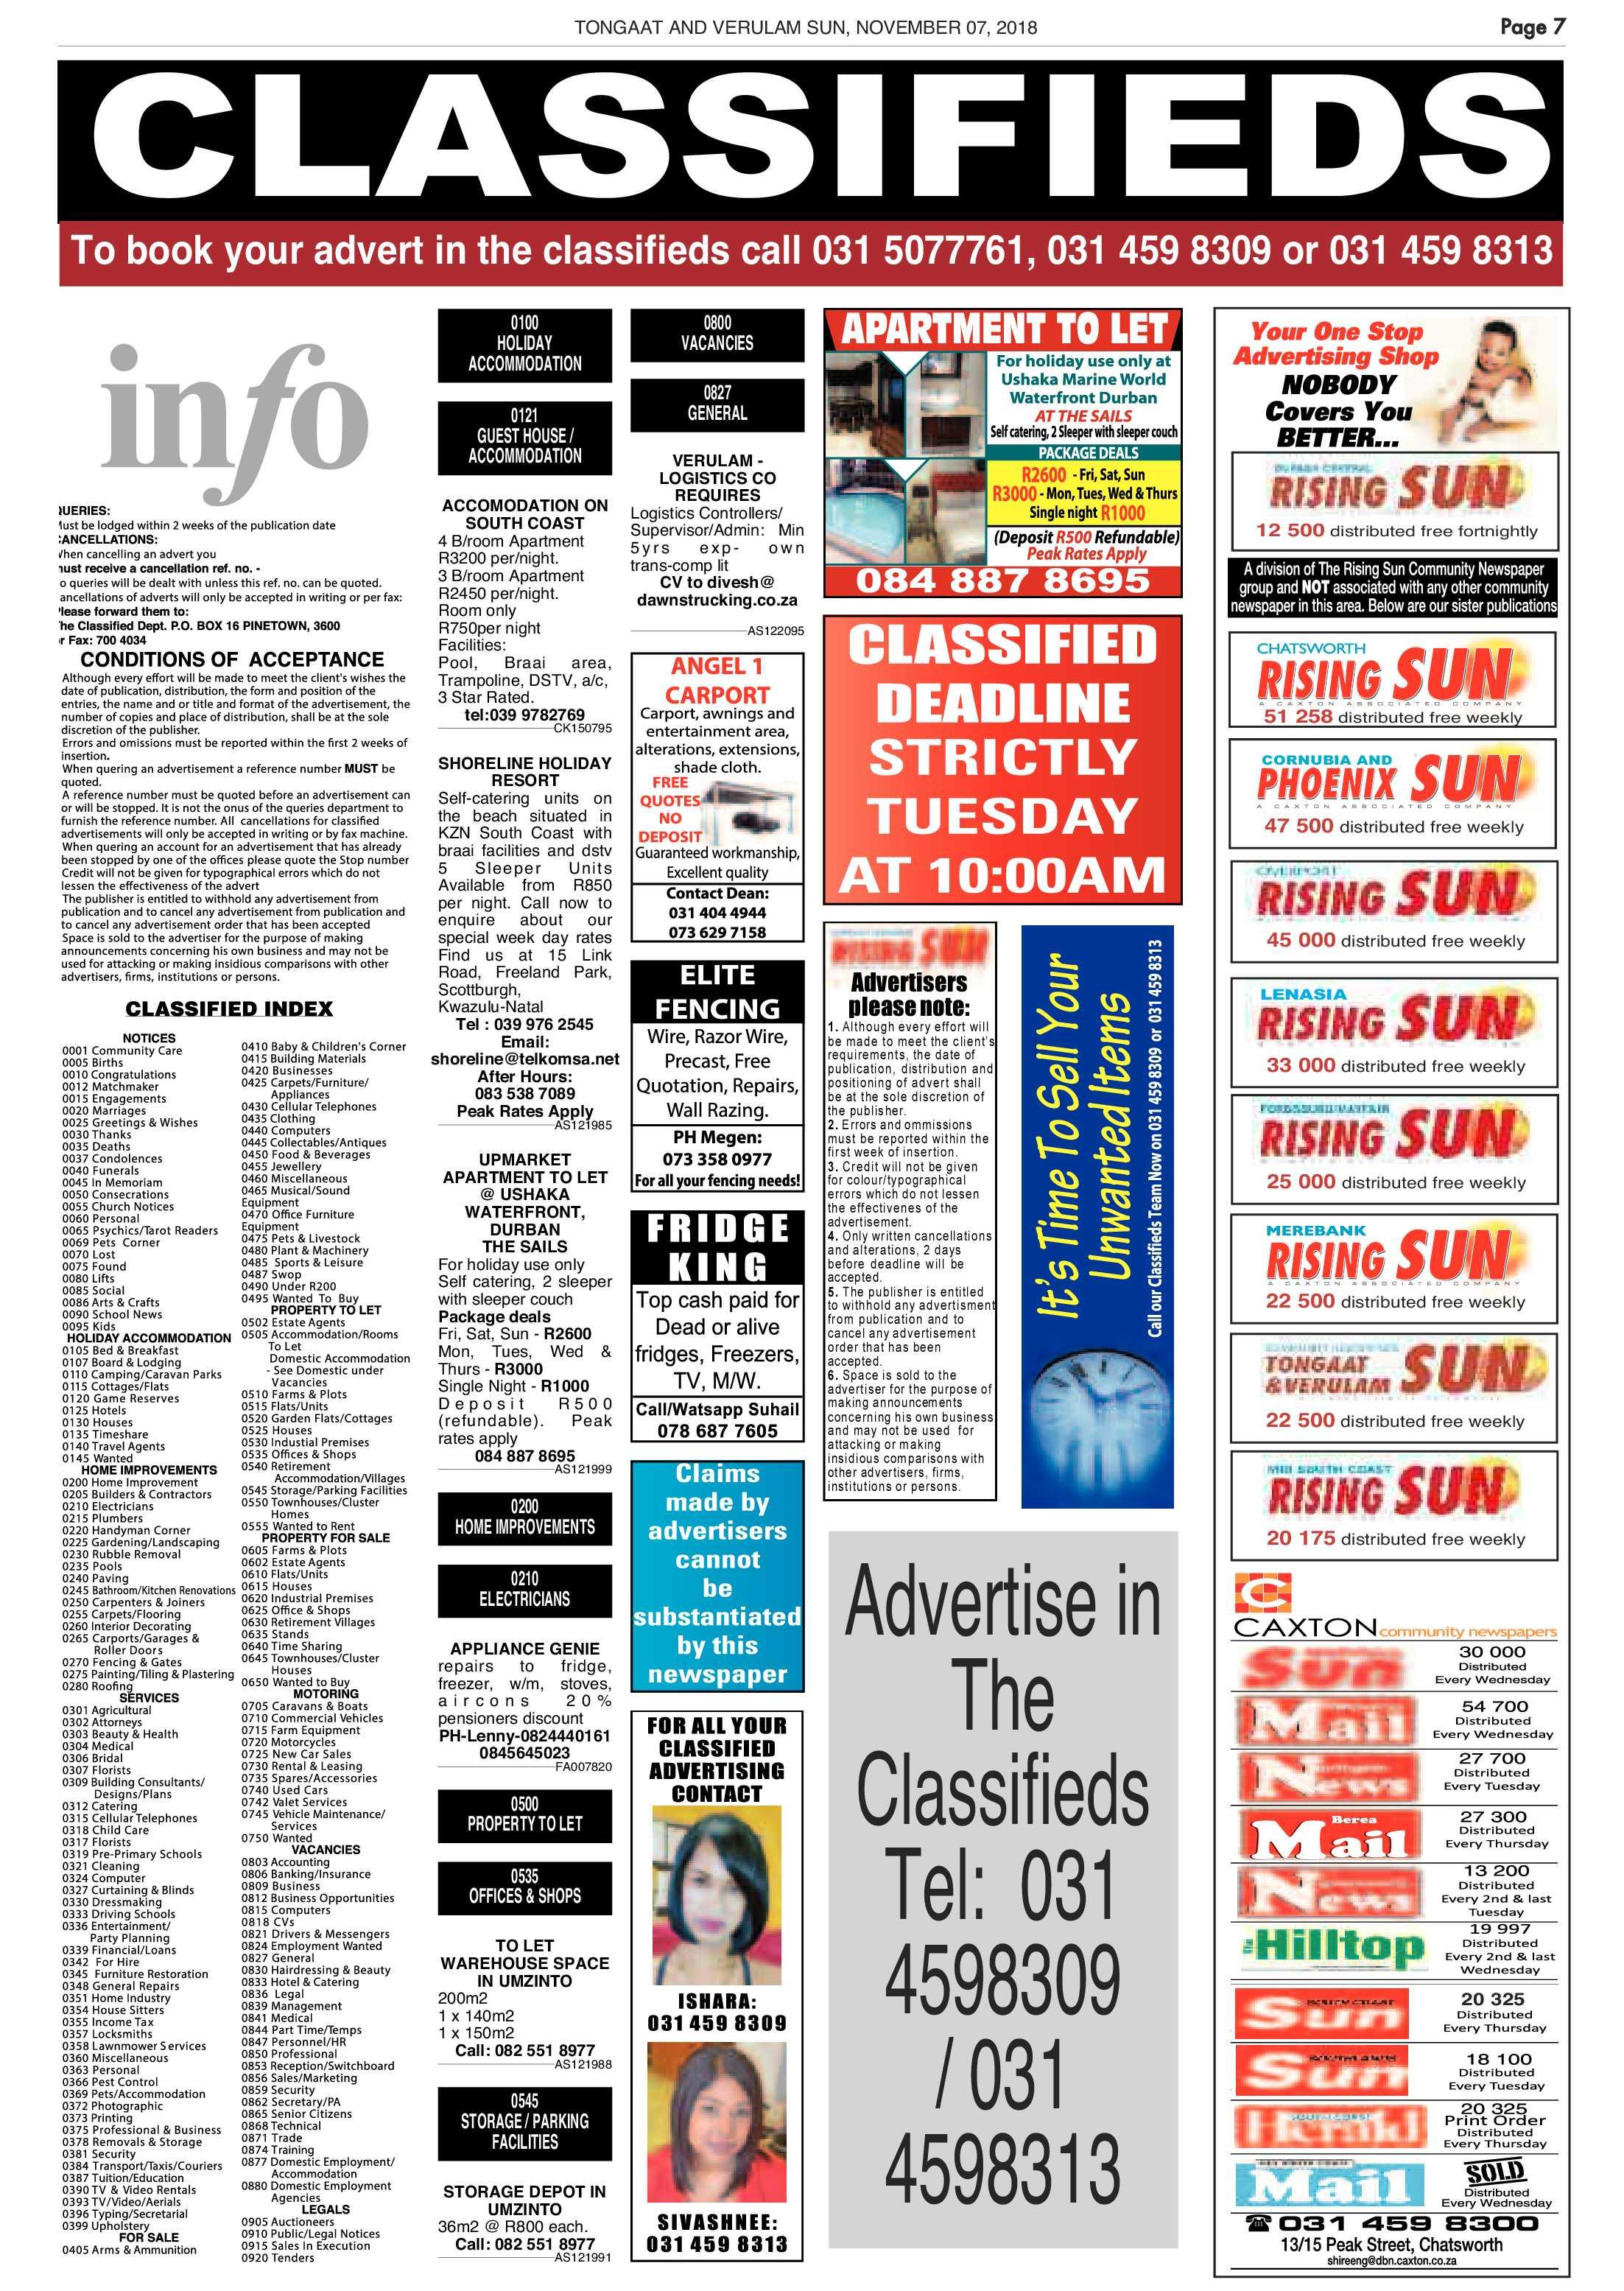 tongaat-verulam-sun-november-7-epapers-page-7